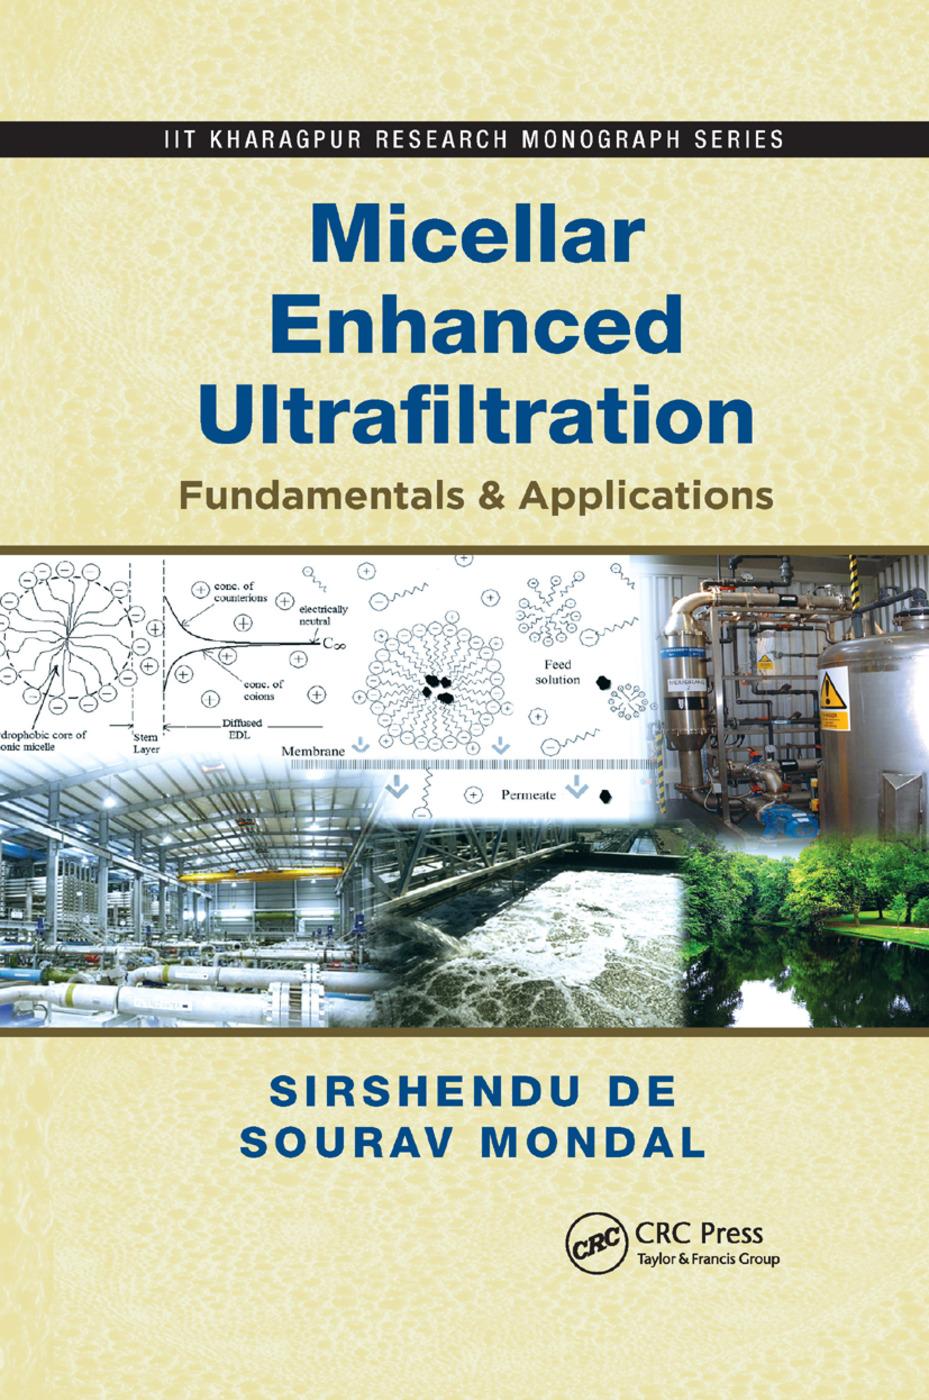 Micellar Enhanced Ultrafiltration: Fundamentals & Applications book cover